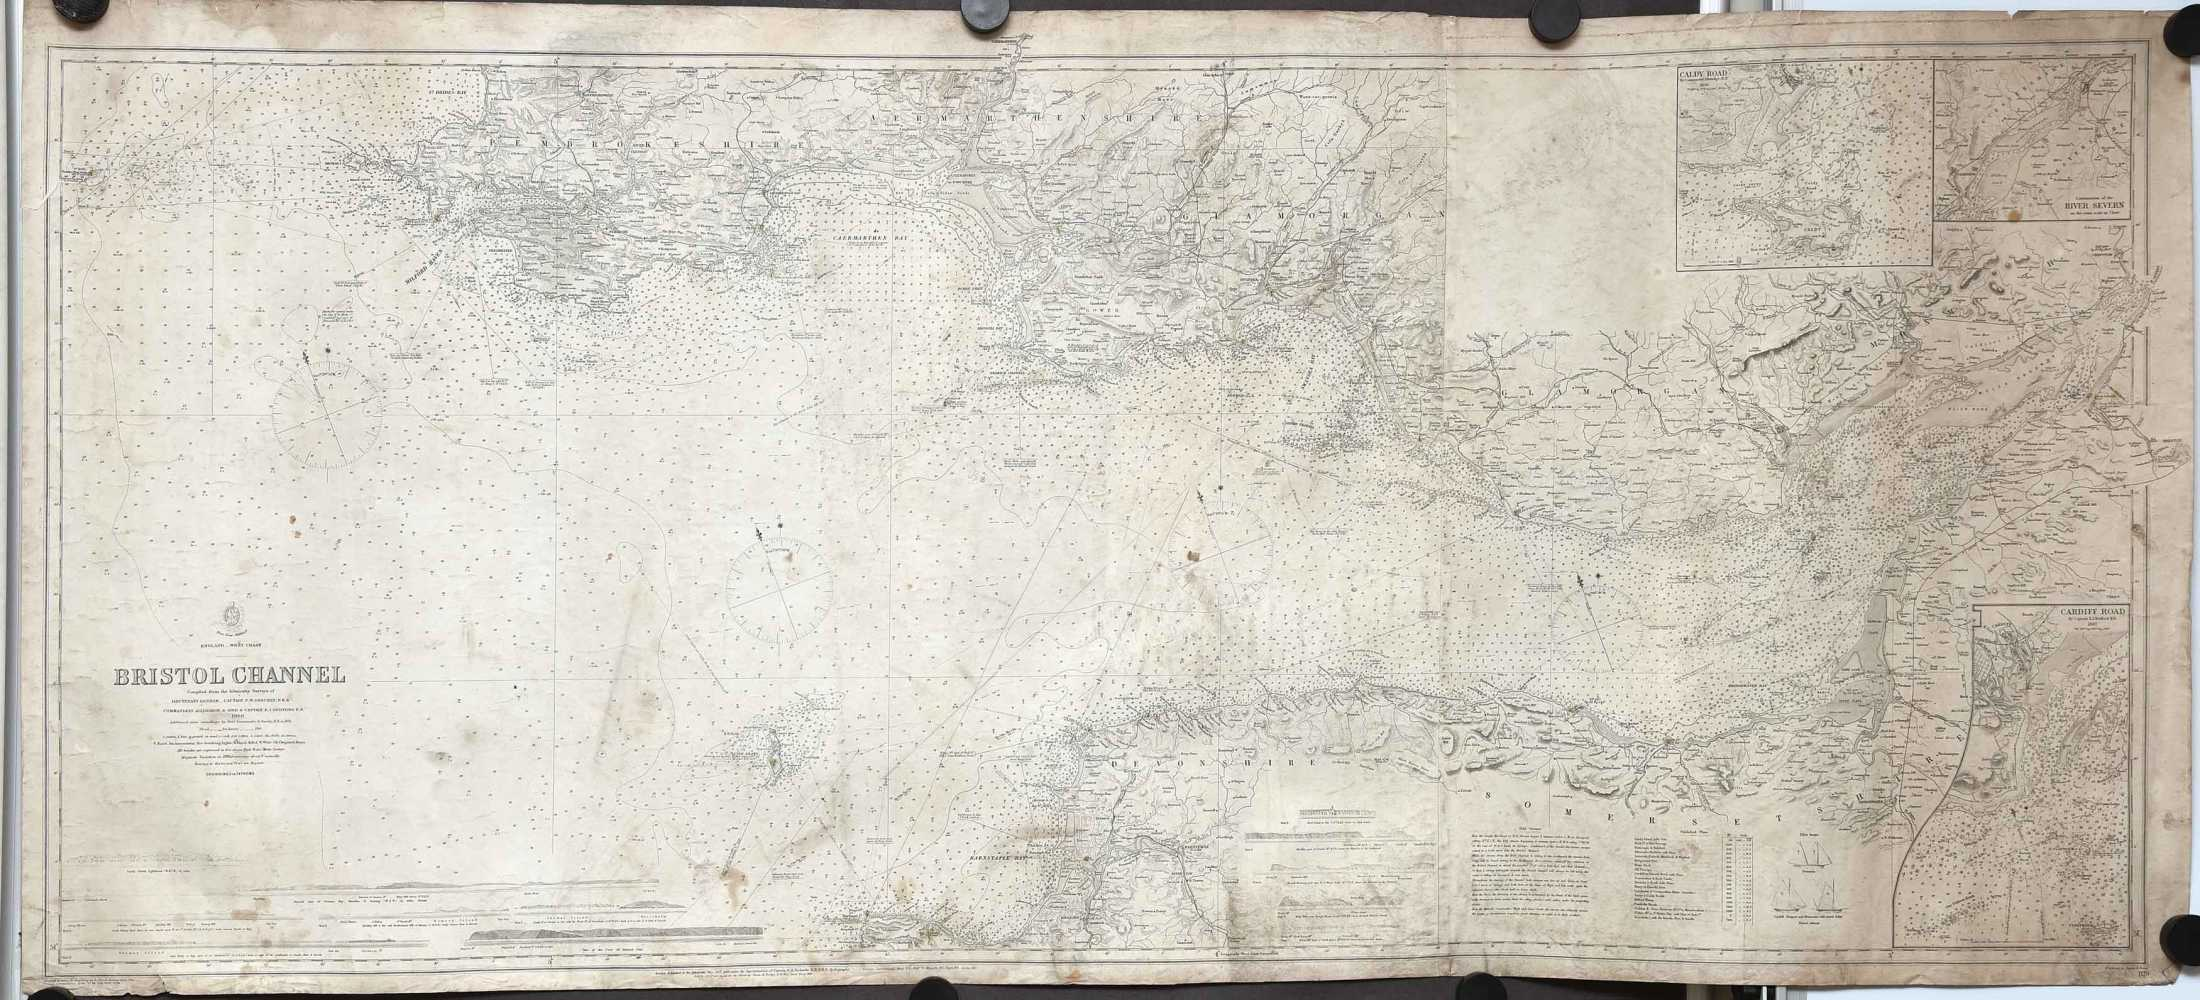 England - West Coast. Bristol Channel